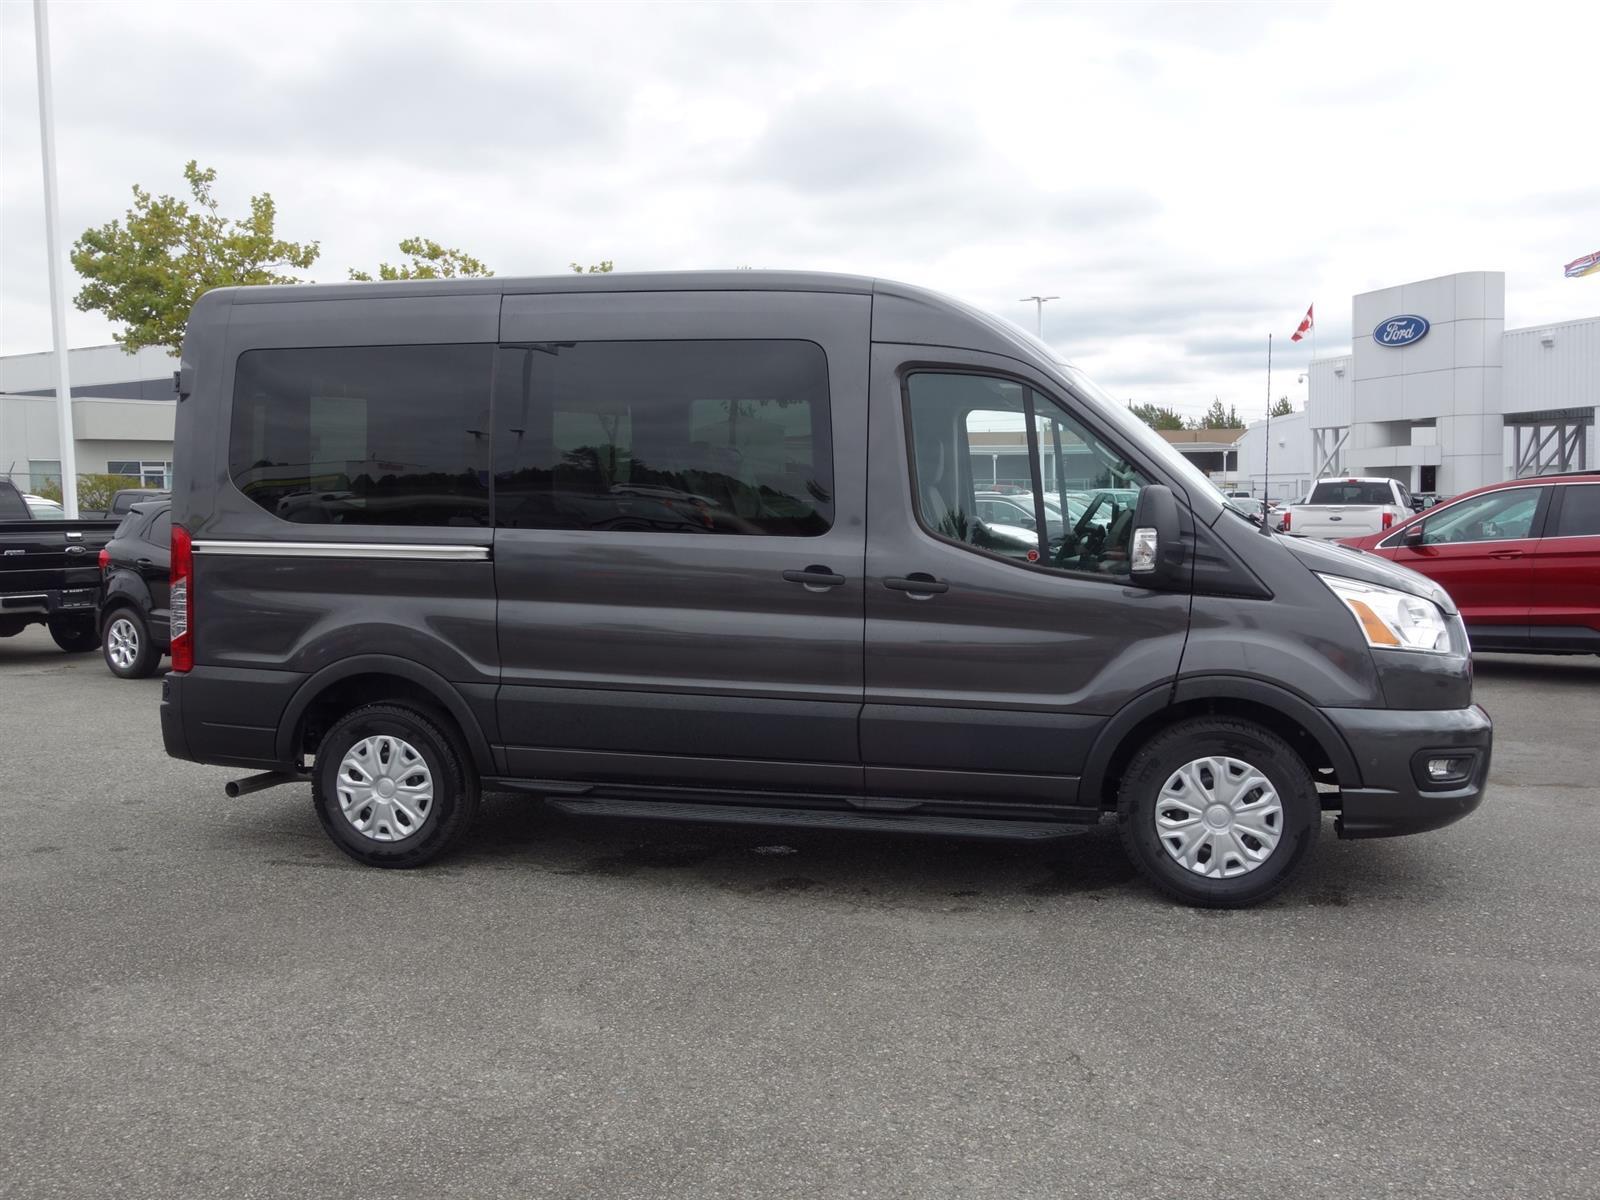 2020 Ford Transit VanWagon Passenger Van XLT